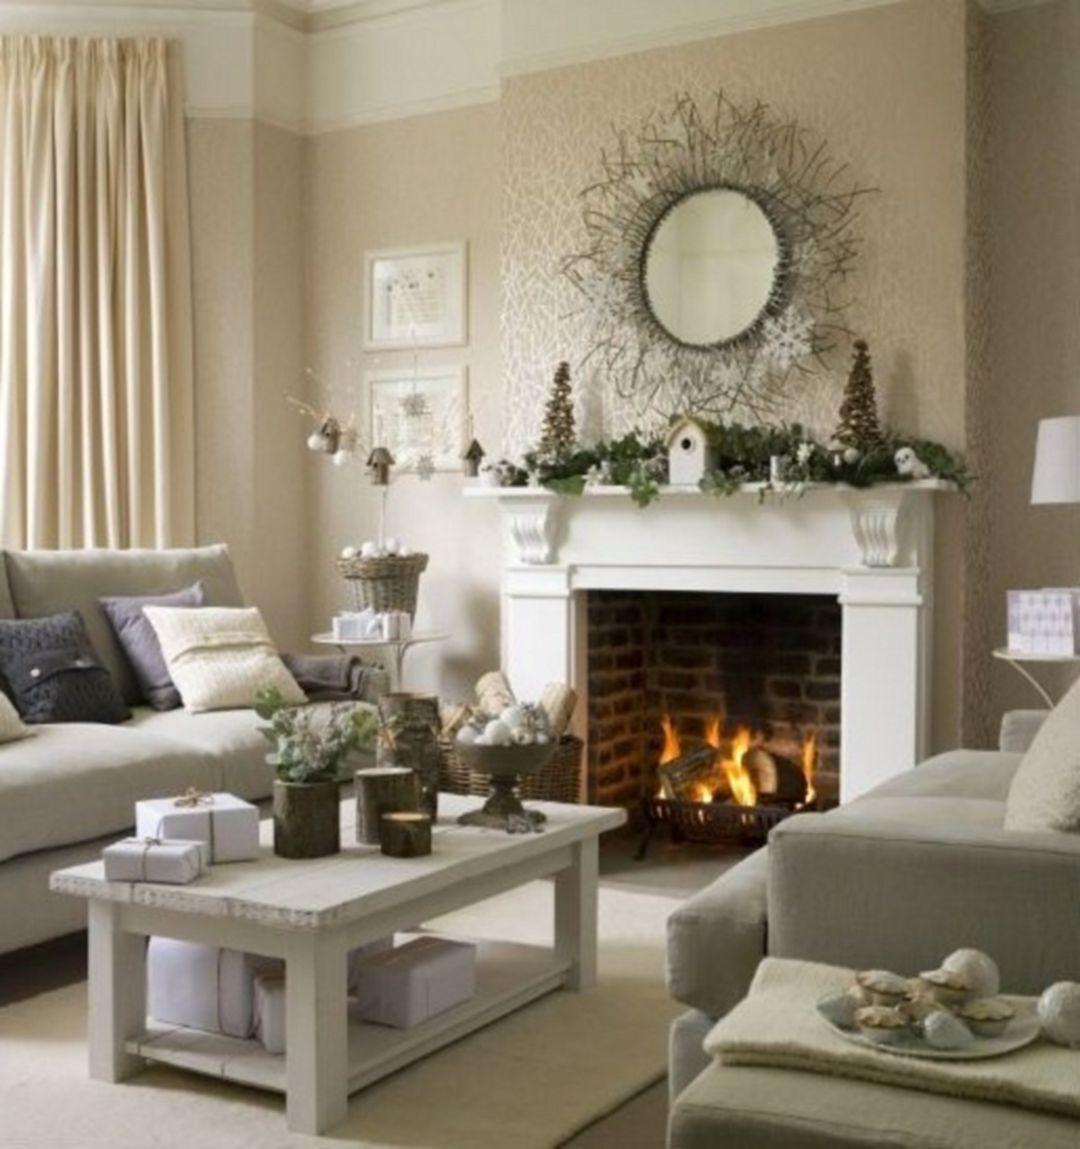 20 Comfortable Winter Living Room Decor Ideas For